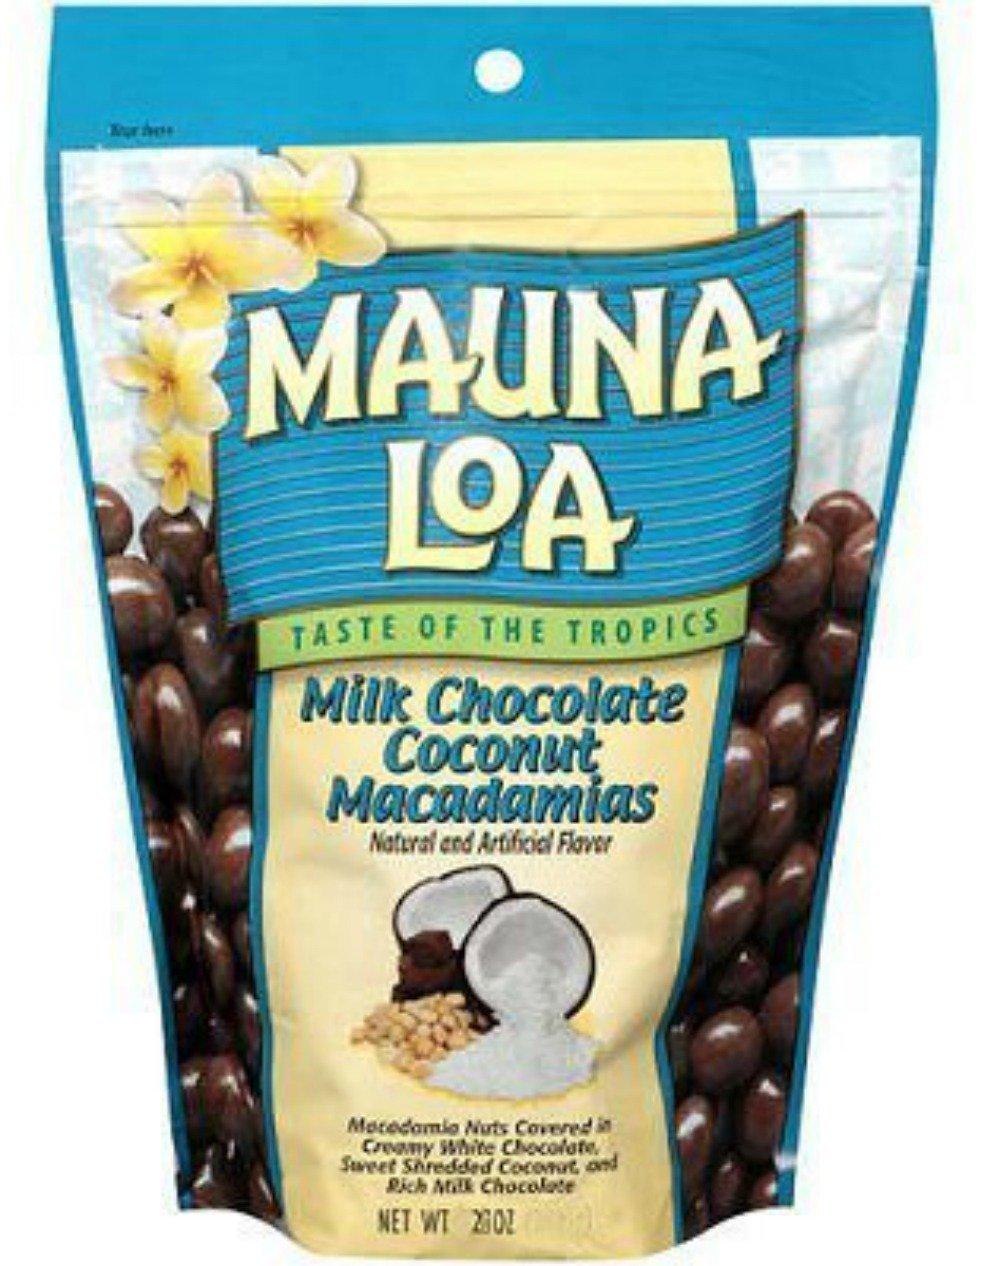 Mauna Loa Macadamias, Milk Chocolate Coconut, 28-Ounce Packages